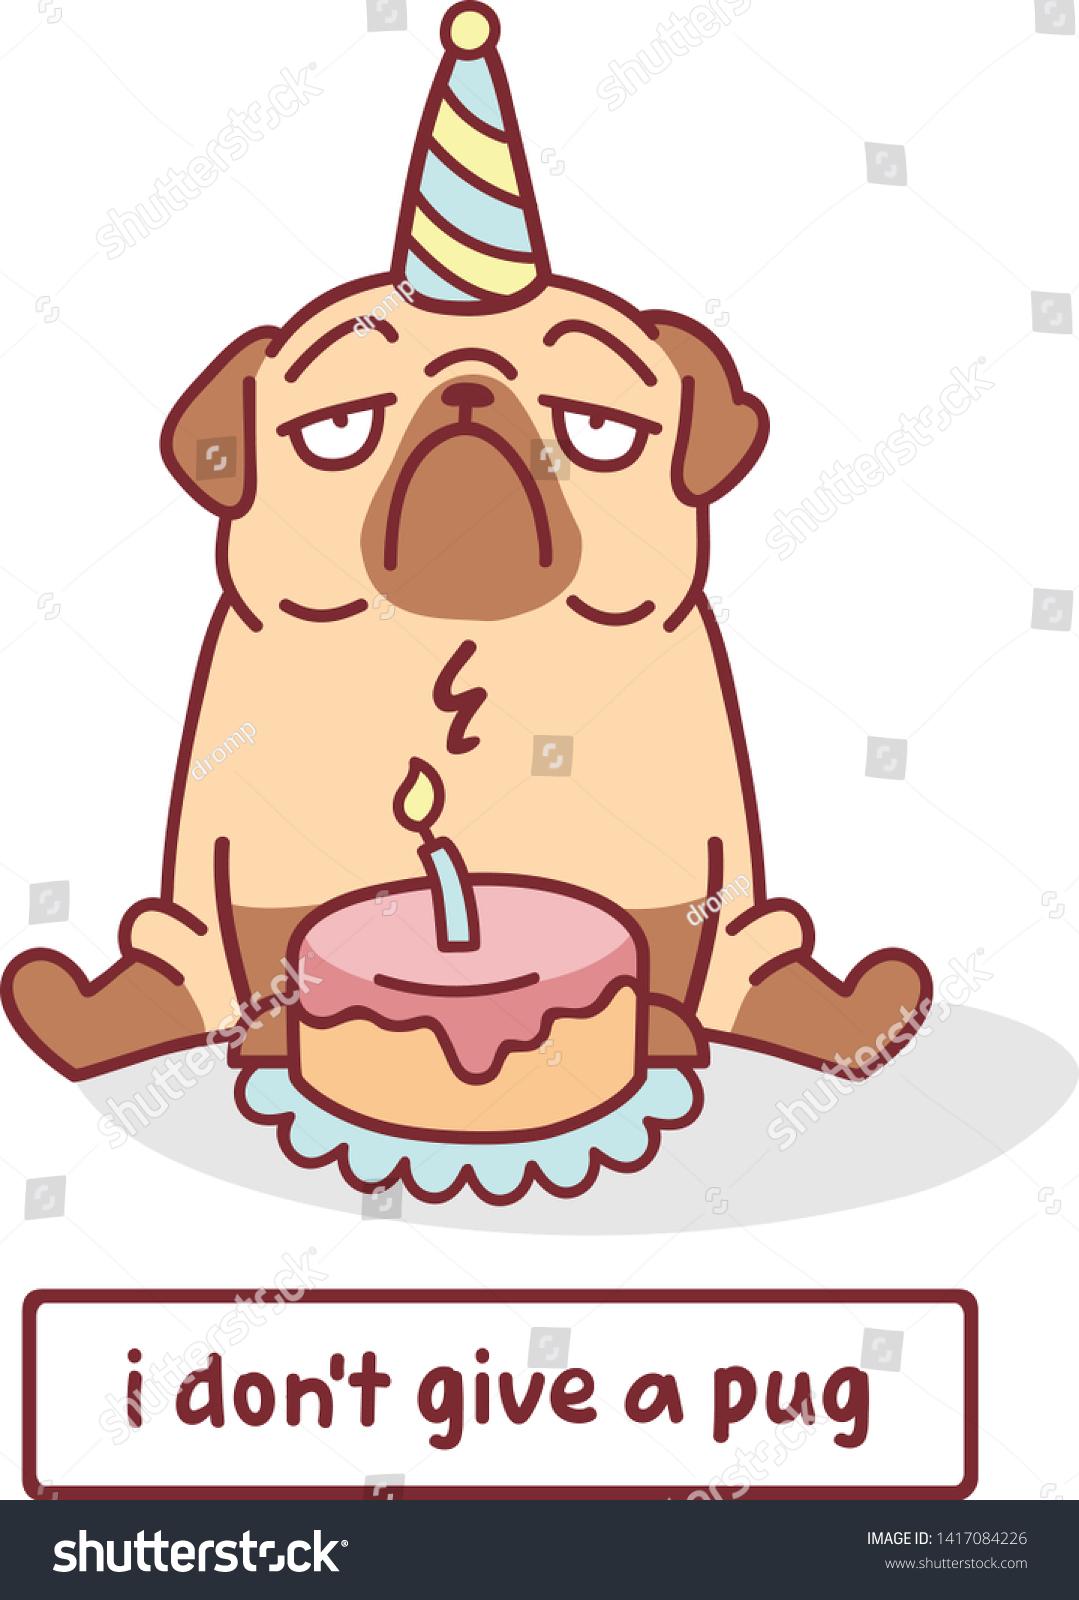 Surprising Cute Cartoon Pug Dog Birthday Cake Stock Vector Royalty Free Funny Birthday Cards Online Bapapcheapnameinfo